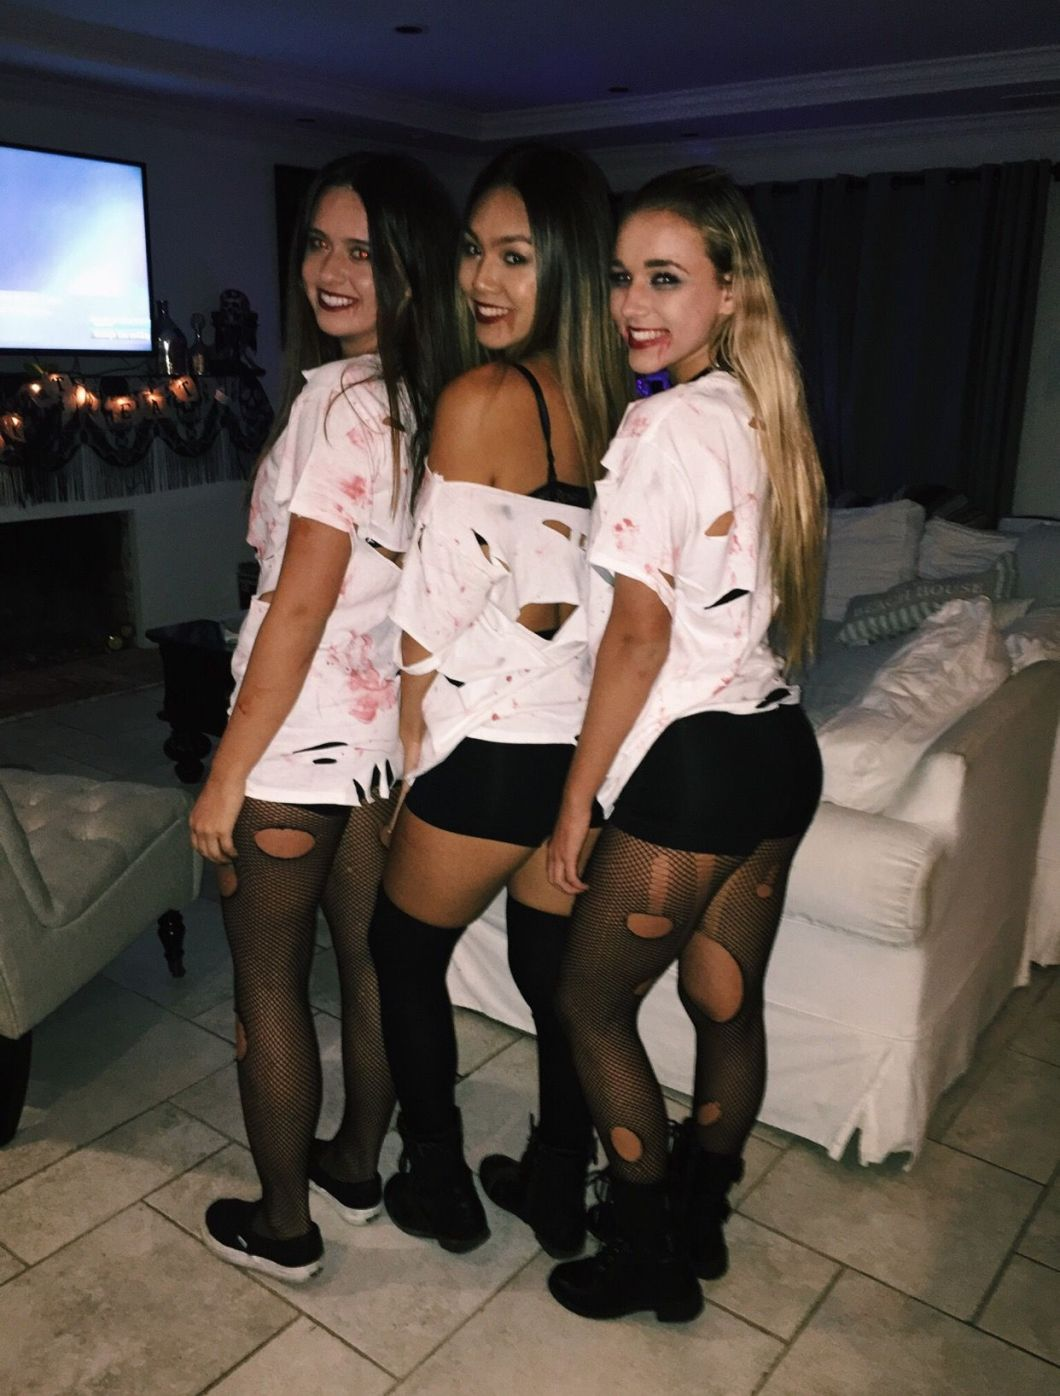 halloween costume ideas 2017 college ✓ the halloween costumes